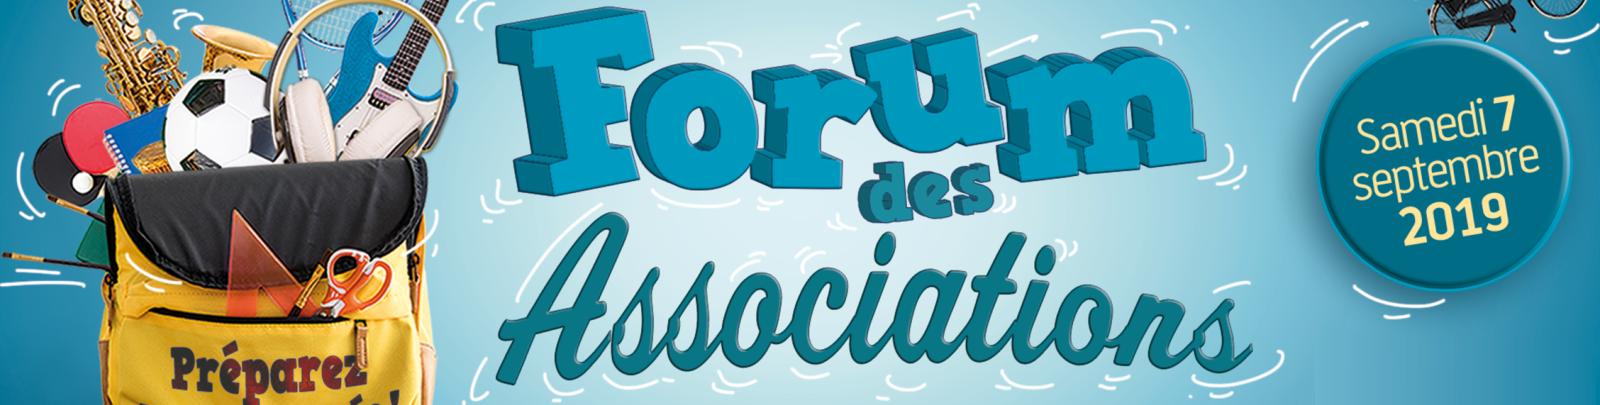 csm_header_1920x720px__forum_des_associations_2019_975ff4742f.png